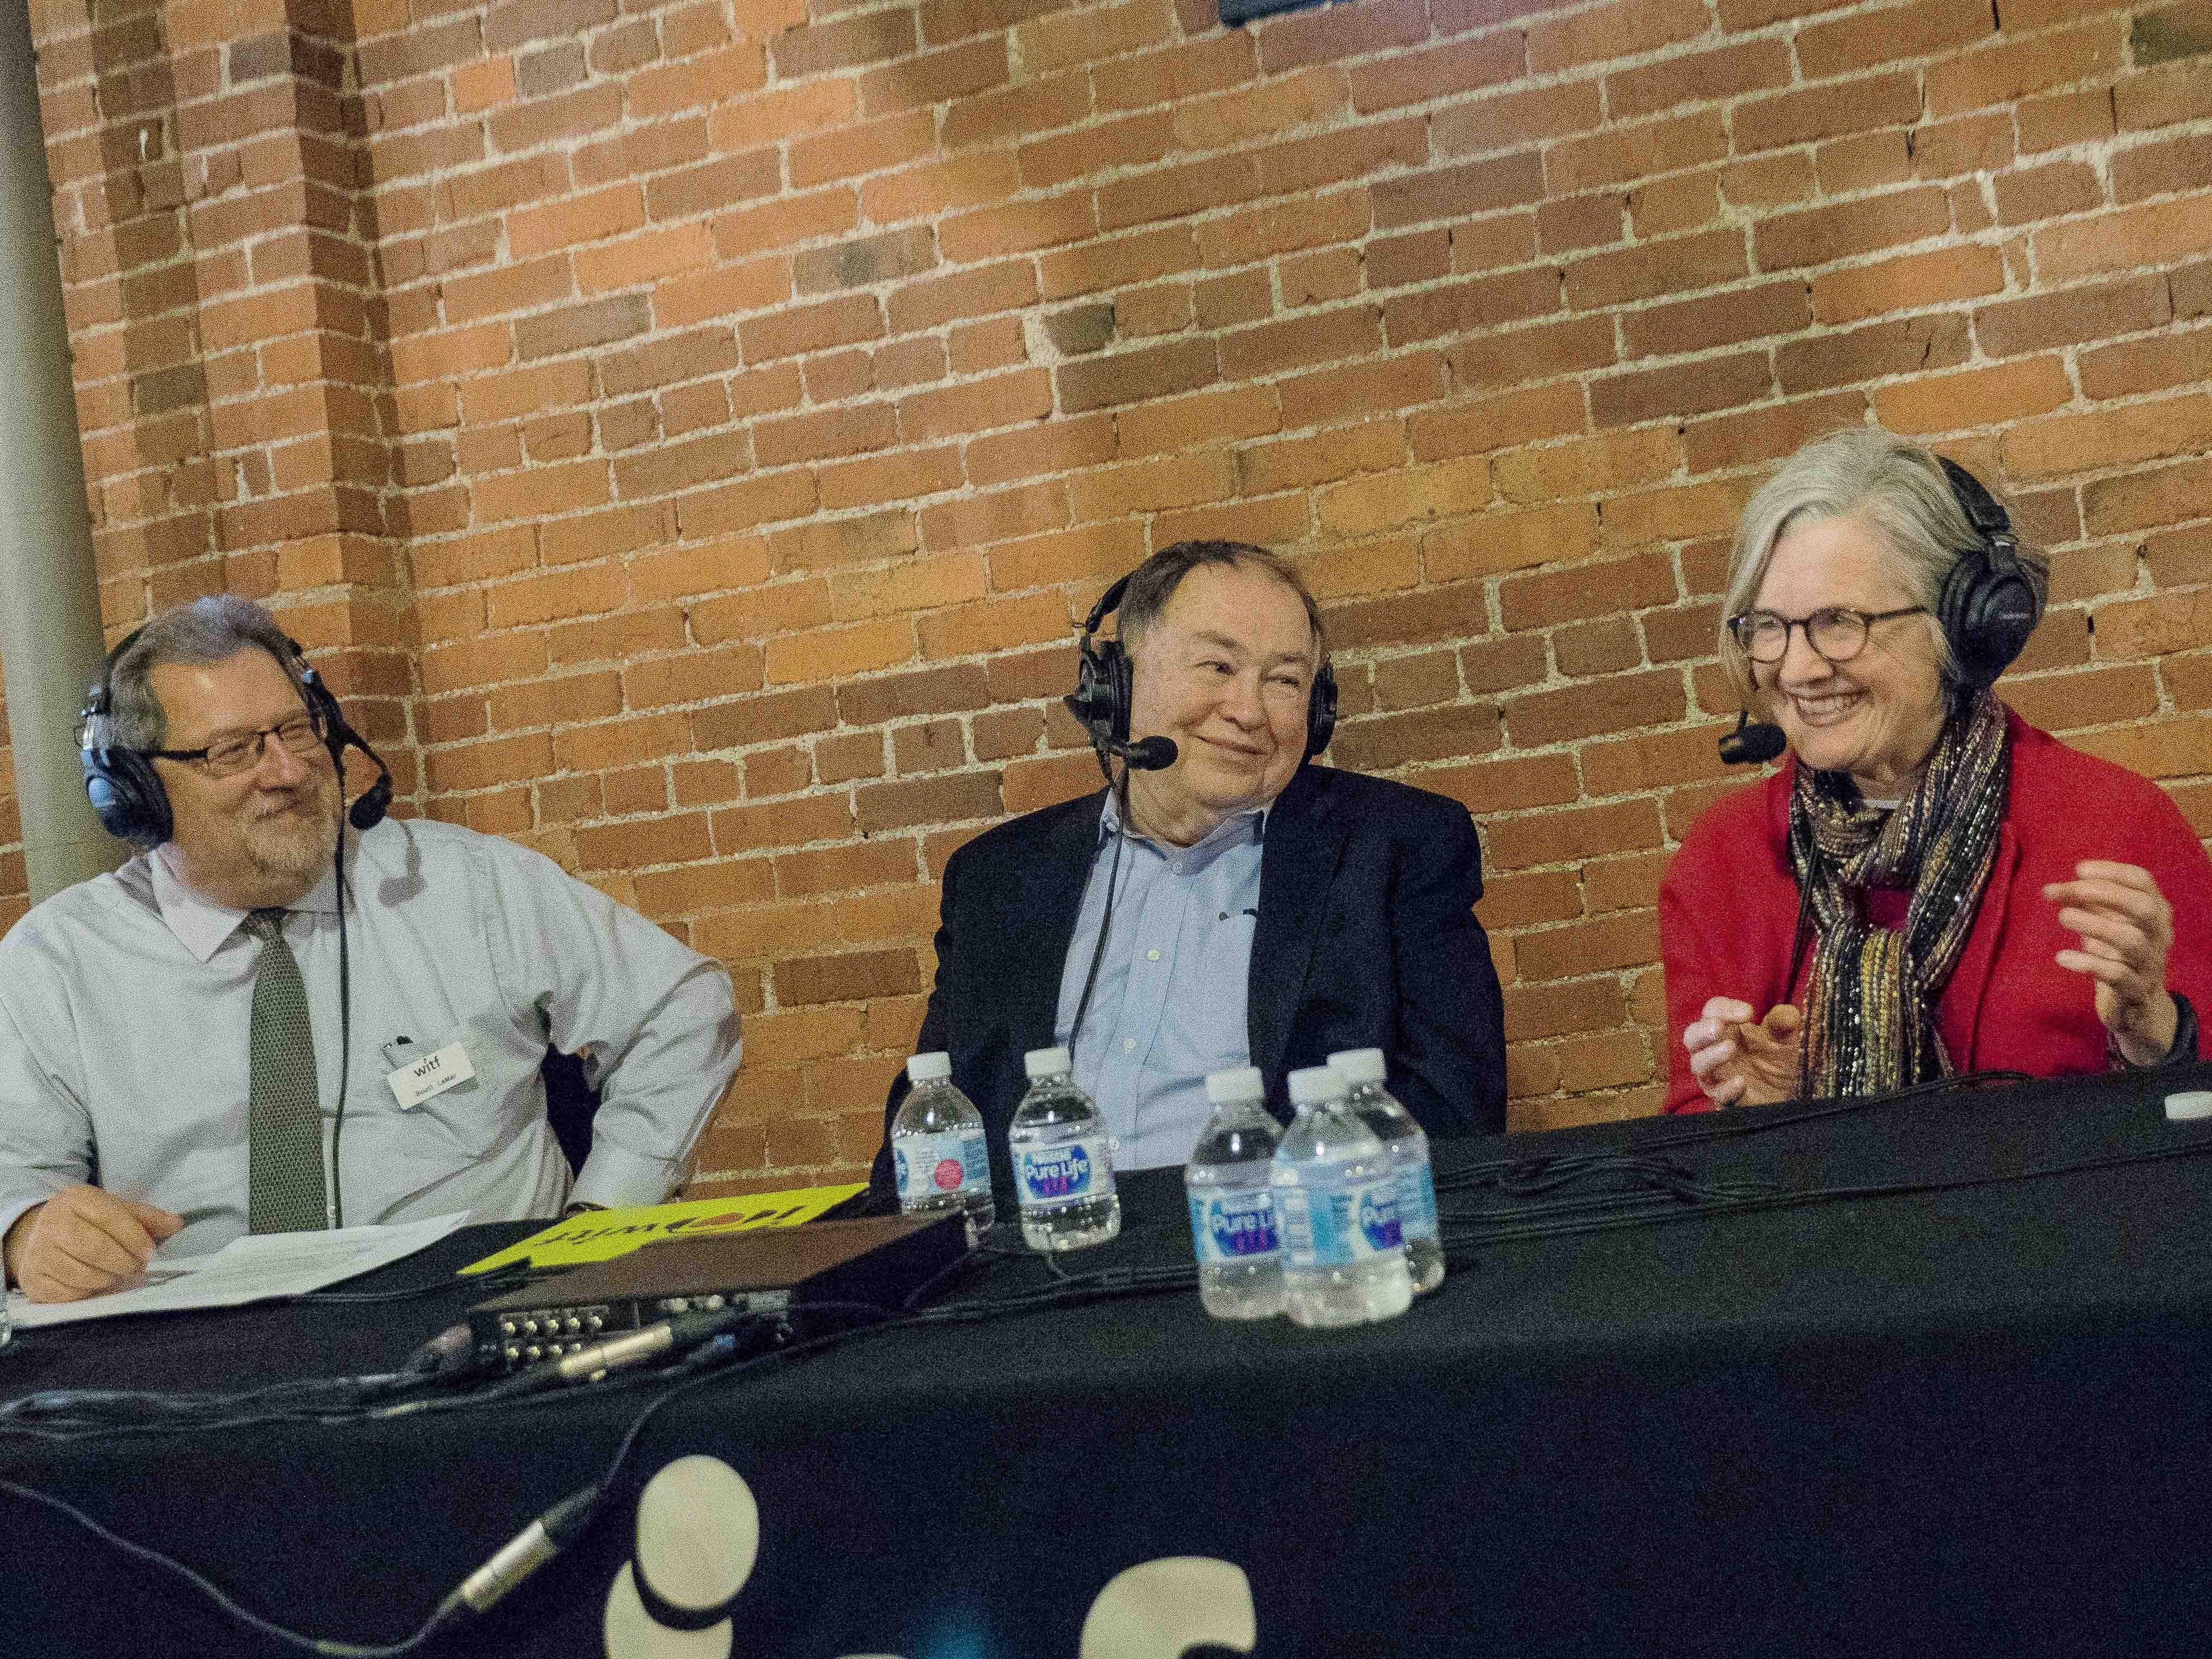 PRX » Piece » Smart Talk - Mister Rogers' Neighborhood 50th